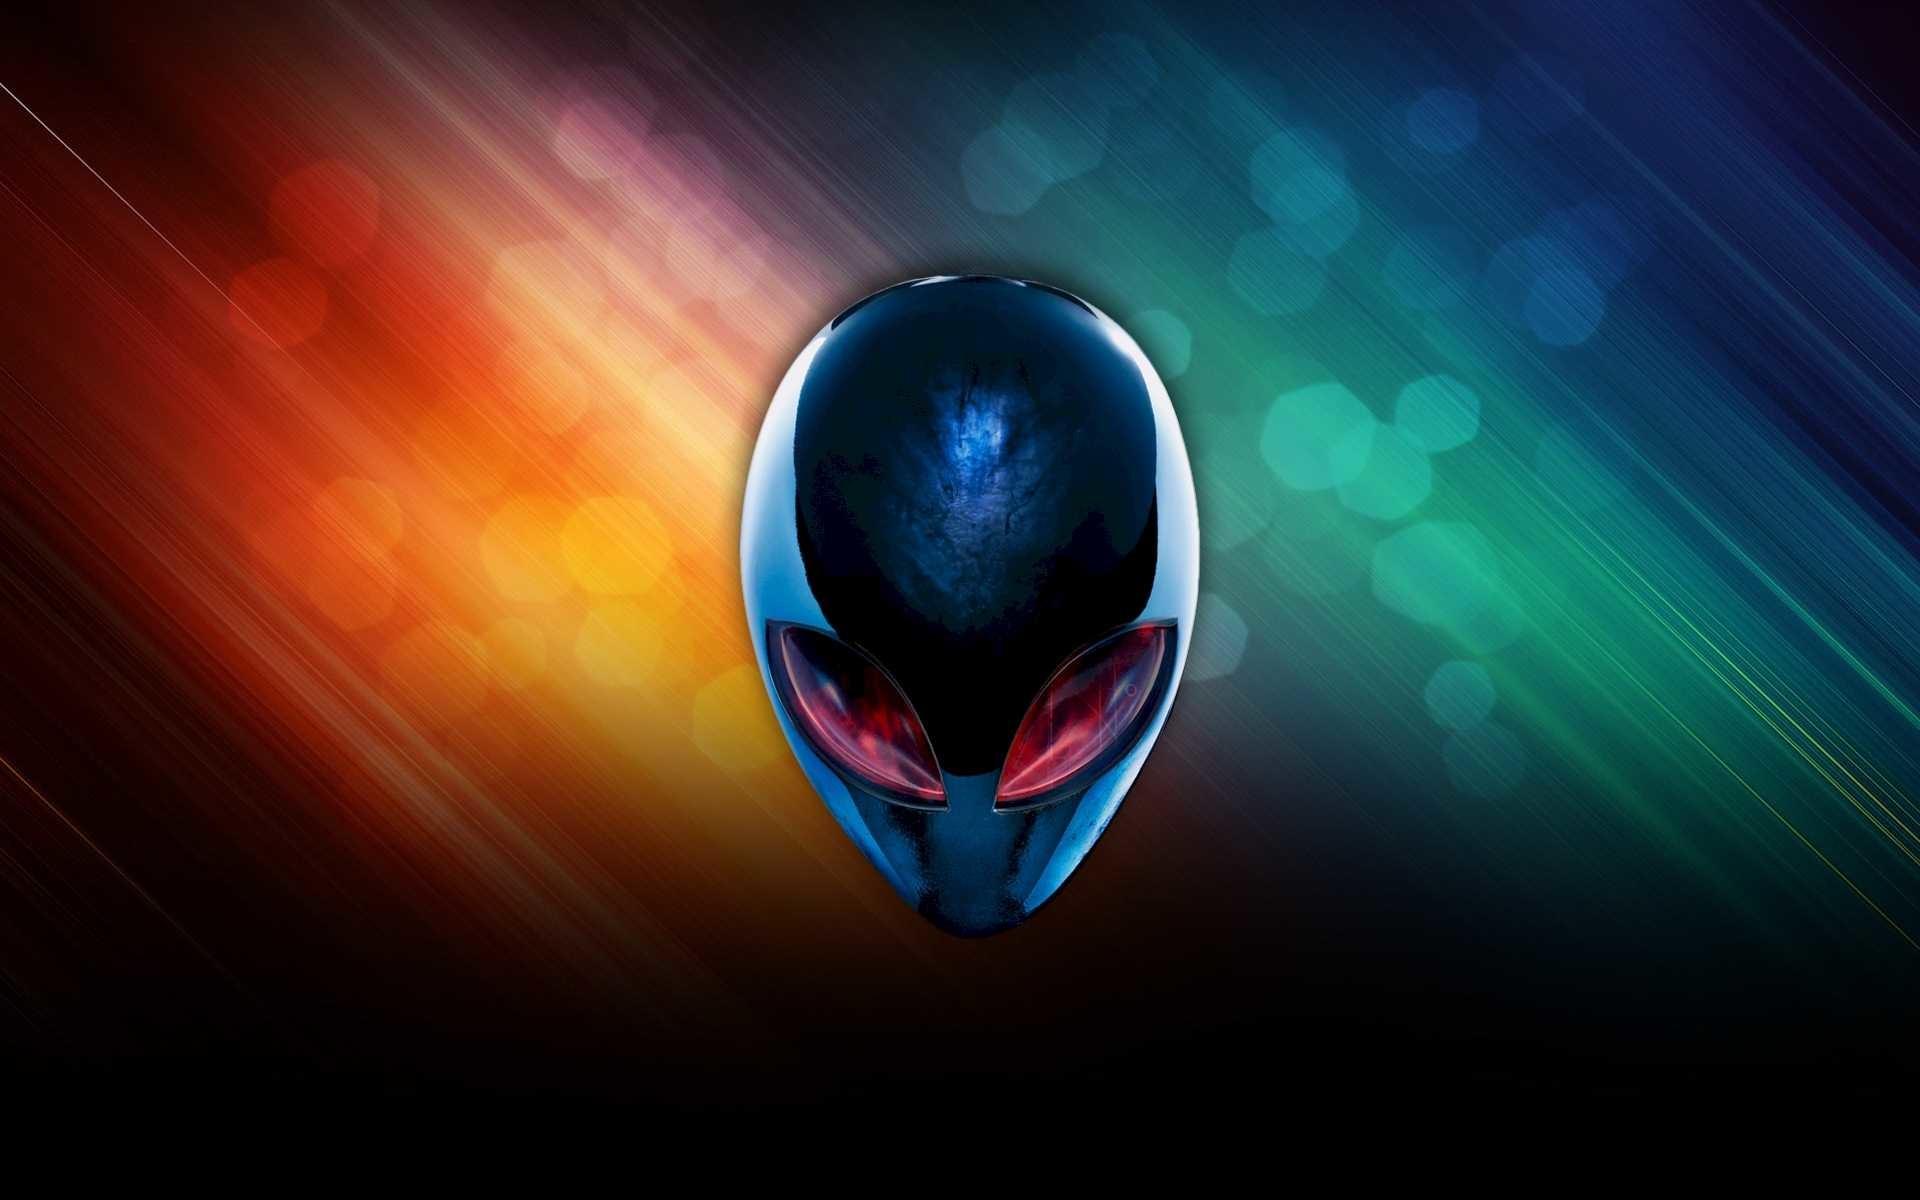 Alienware Wallpaper Desktop : Games Wallpaper – Engchou.com